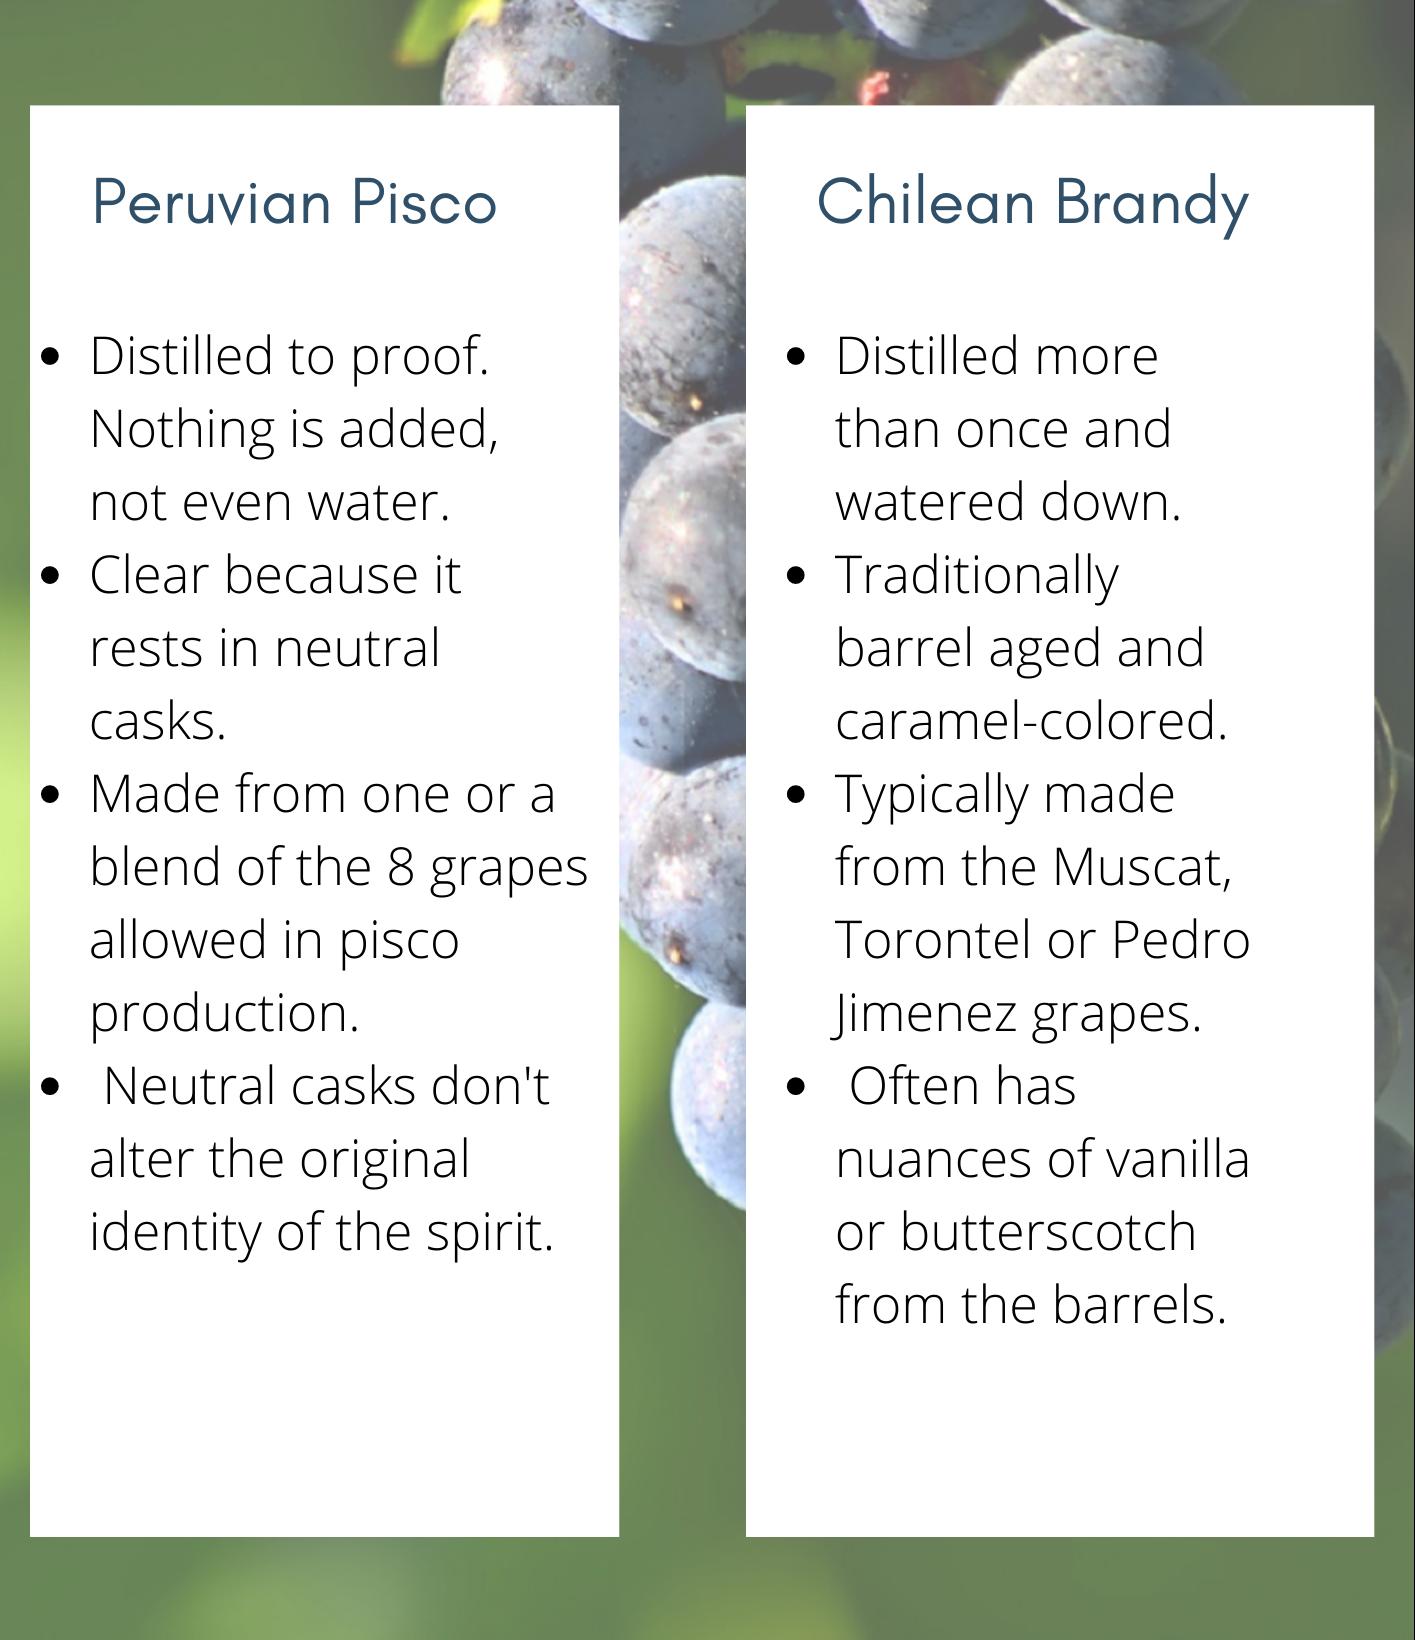 Peruvian pisco vs. chilean, is pisco peruvian